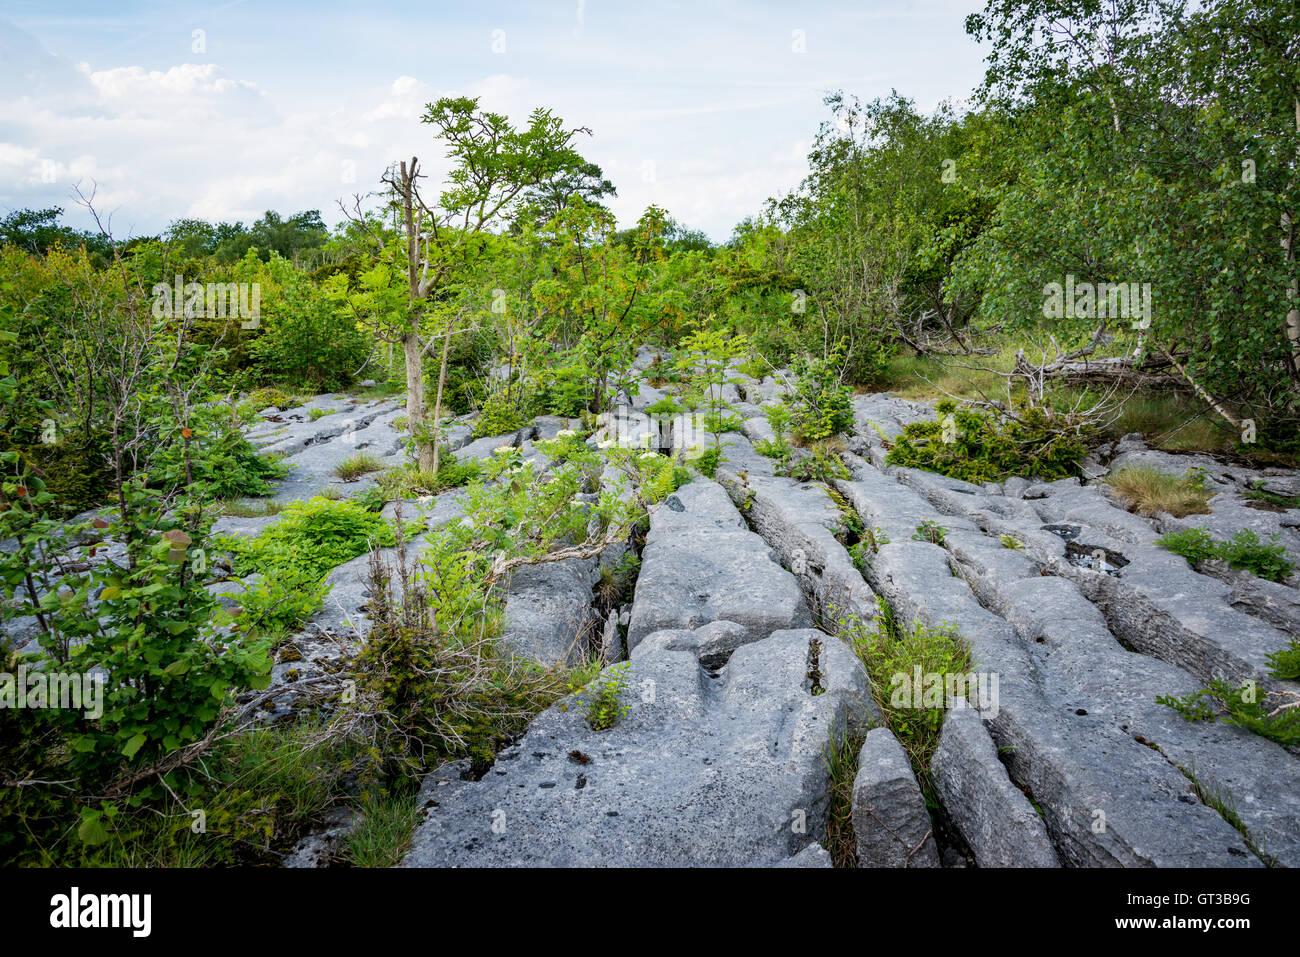 Limestone pavement at Arnside AONB, Cumbria - Stock Image